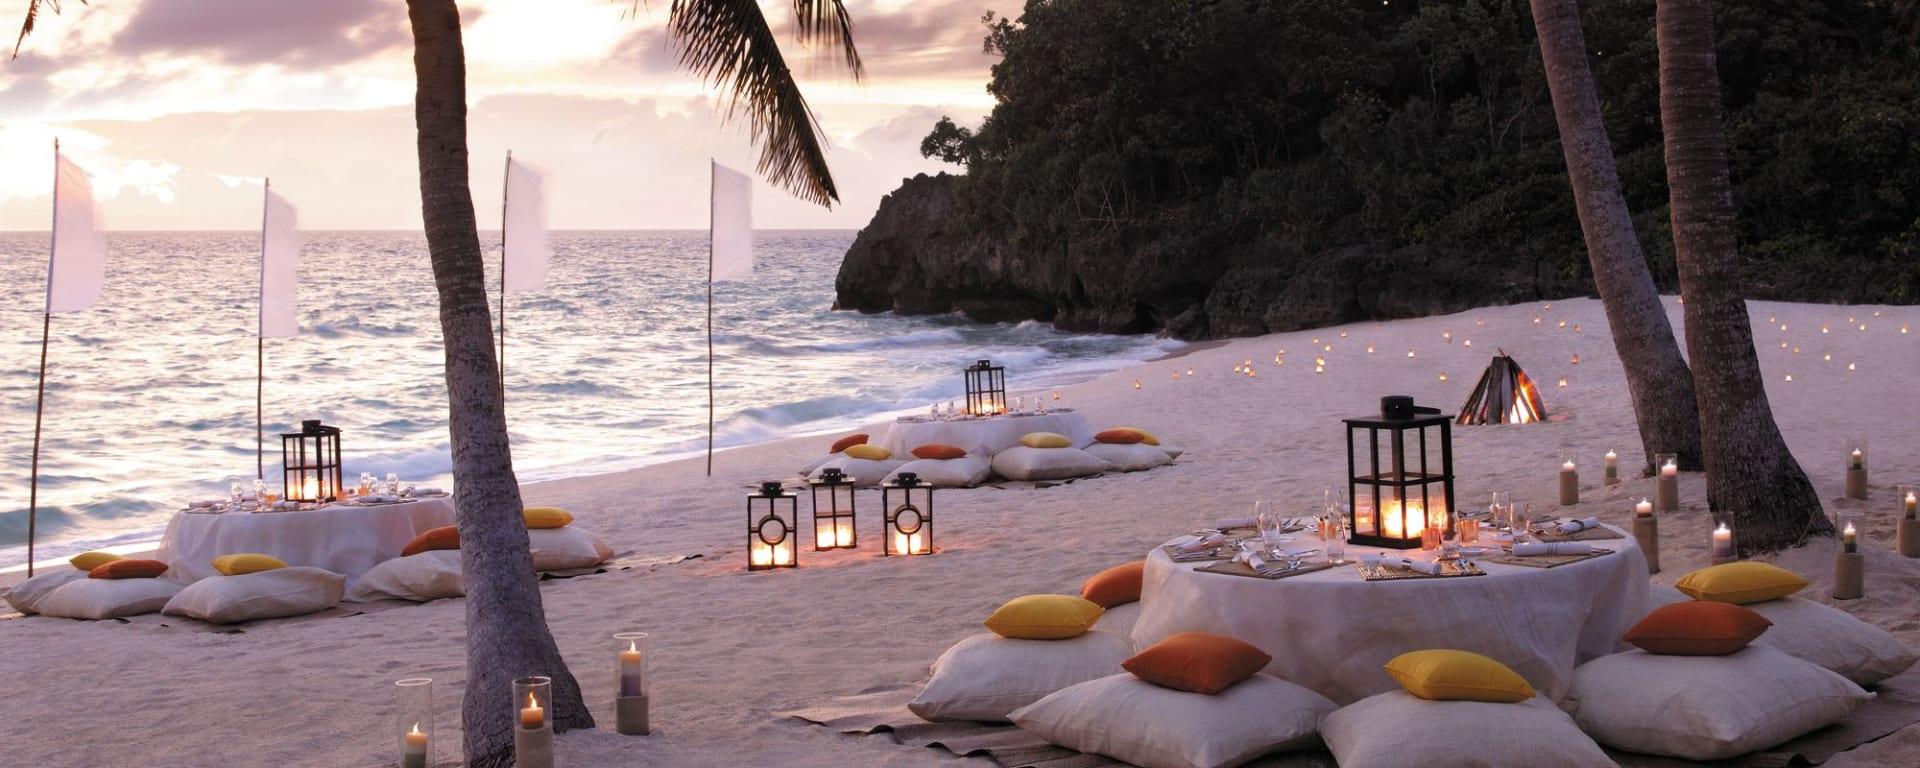 Shangri-La's Boracay Resort & Spa: Beachfront Dinner Party